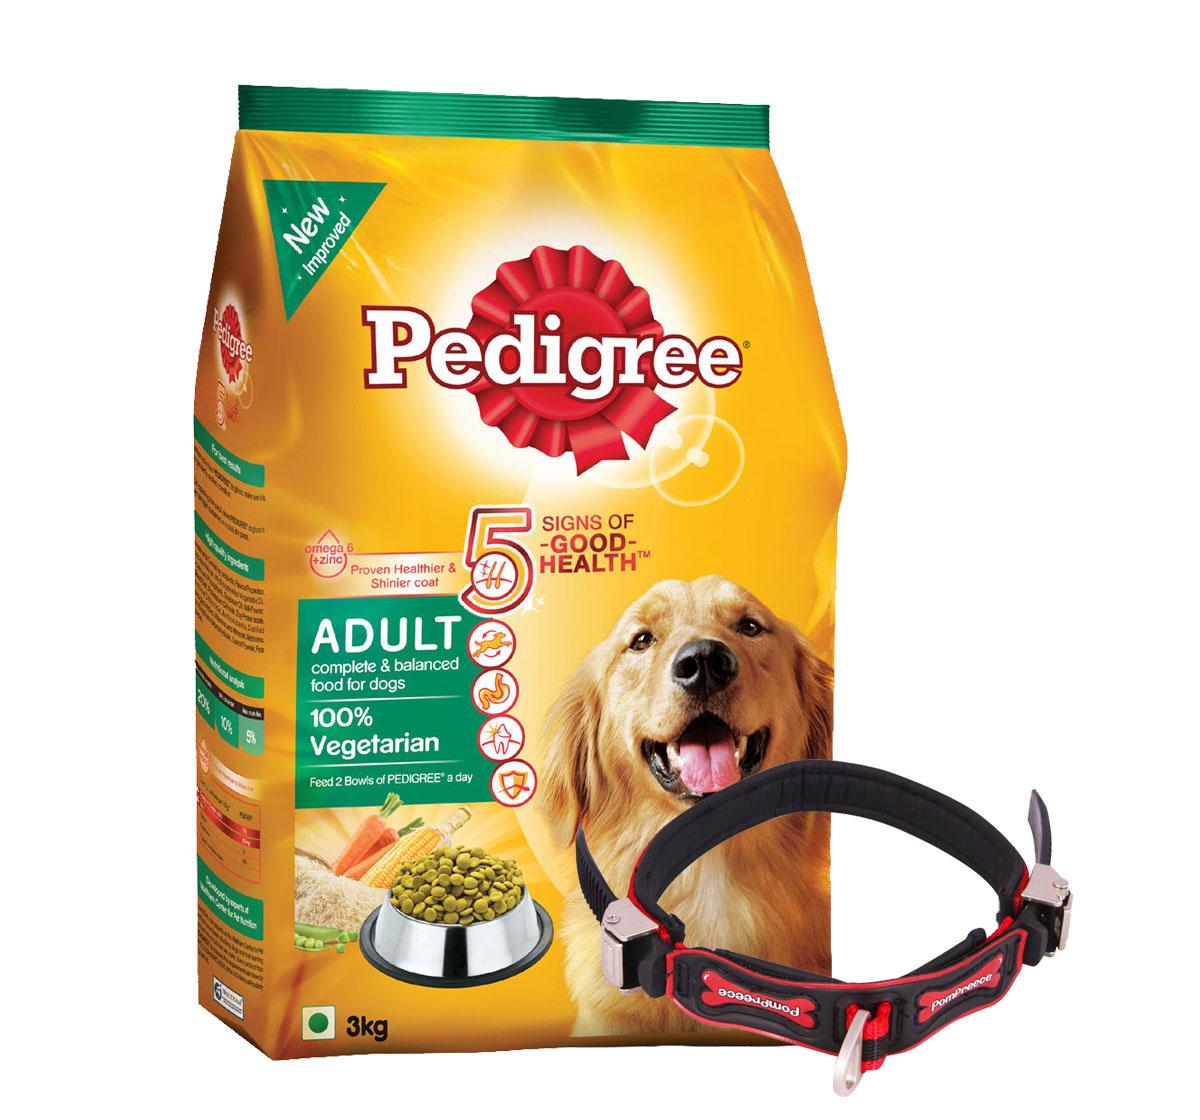 Pedigree Dog Food Adult 100% Vegetarian - 3 Kg With Ergocomfort Dog Collar Large-Red